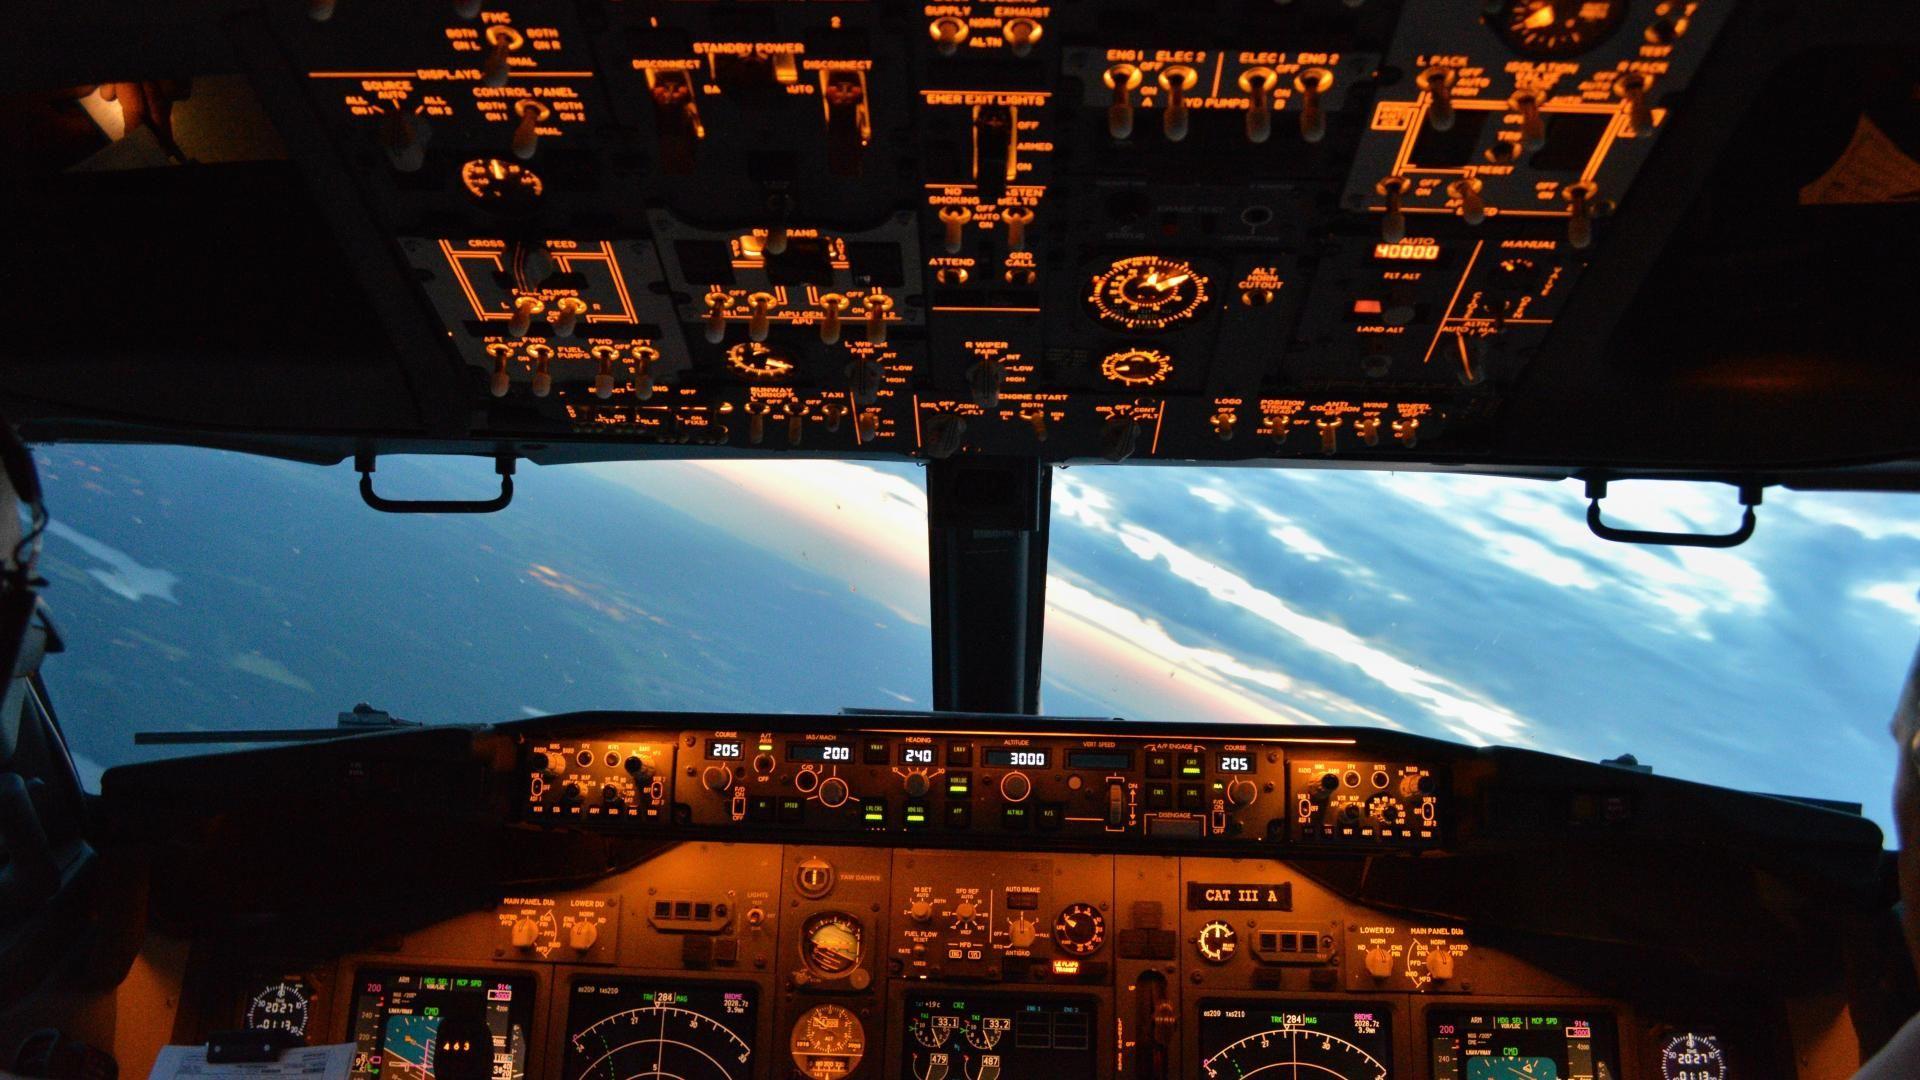 Boeing 737 Cockpit Wallpaper In 2019 Boeing 737 Cockpit